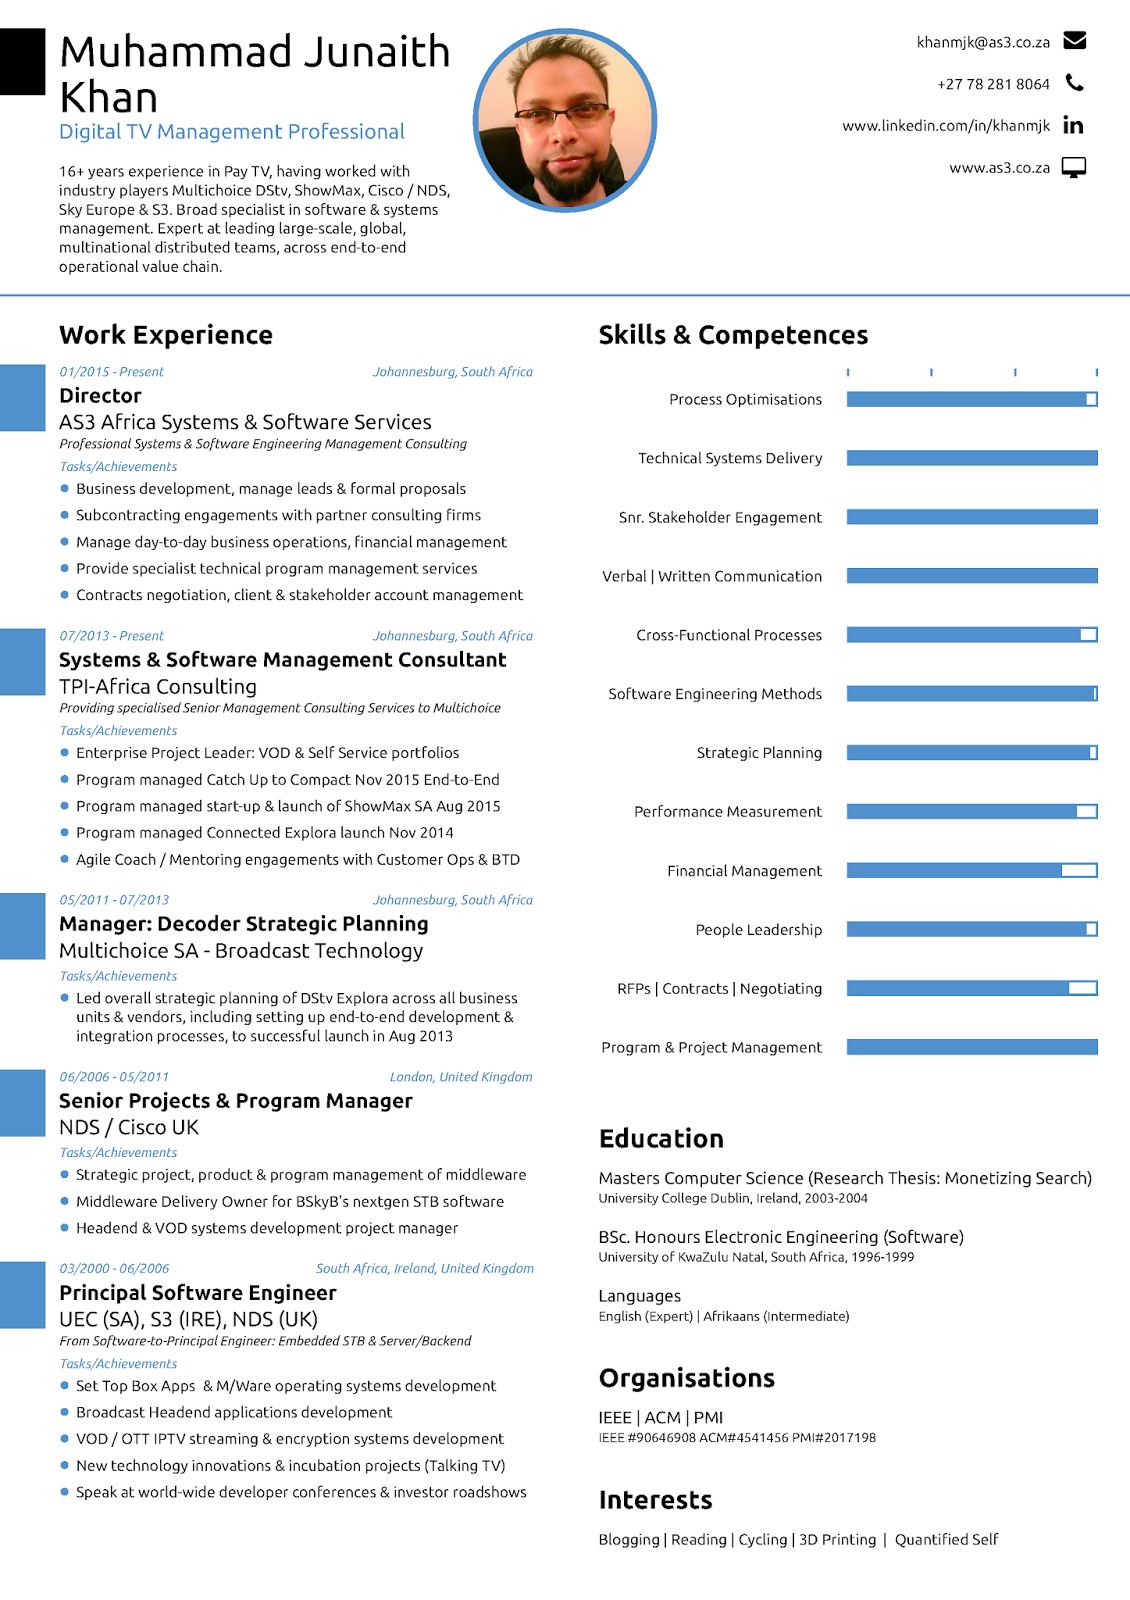 resume created using novoresume - Novo Resume